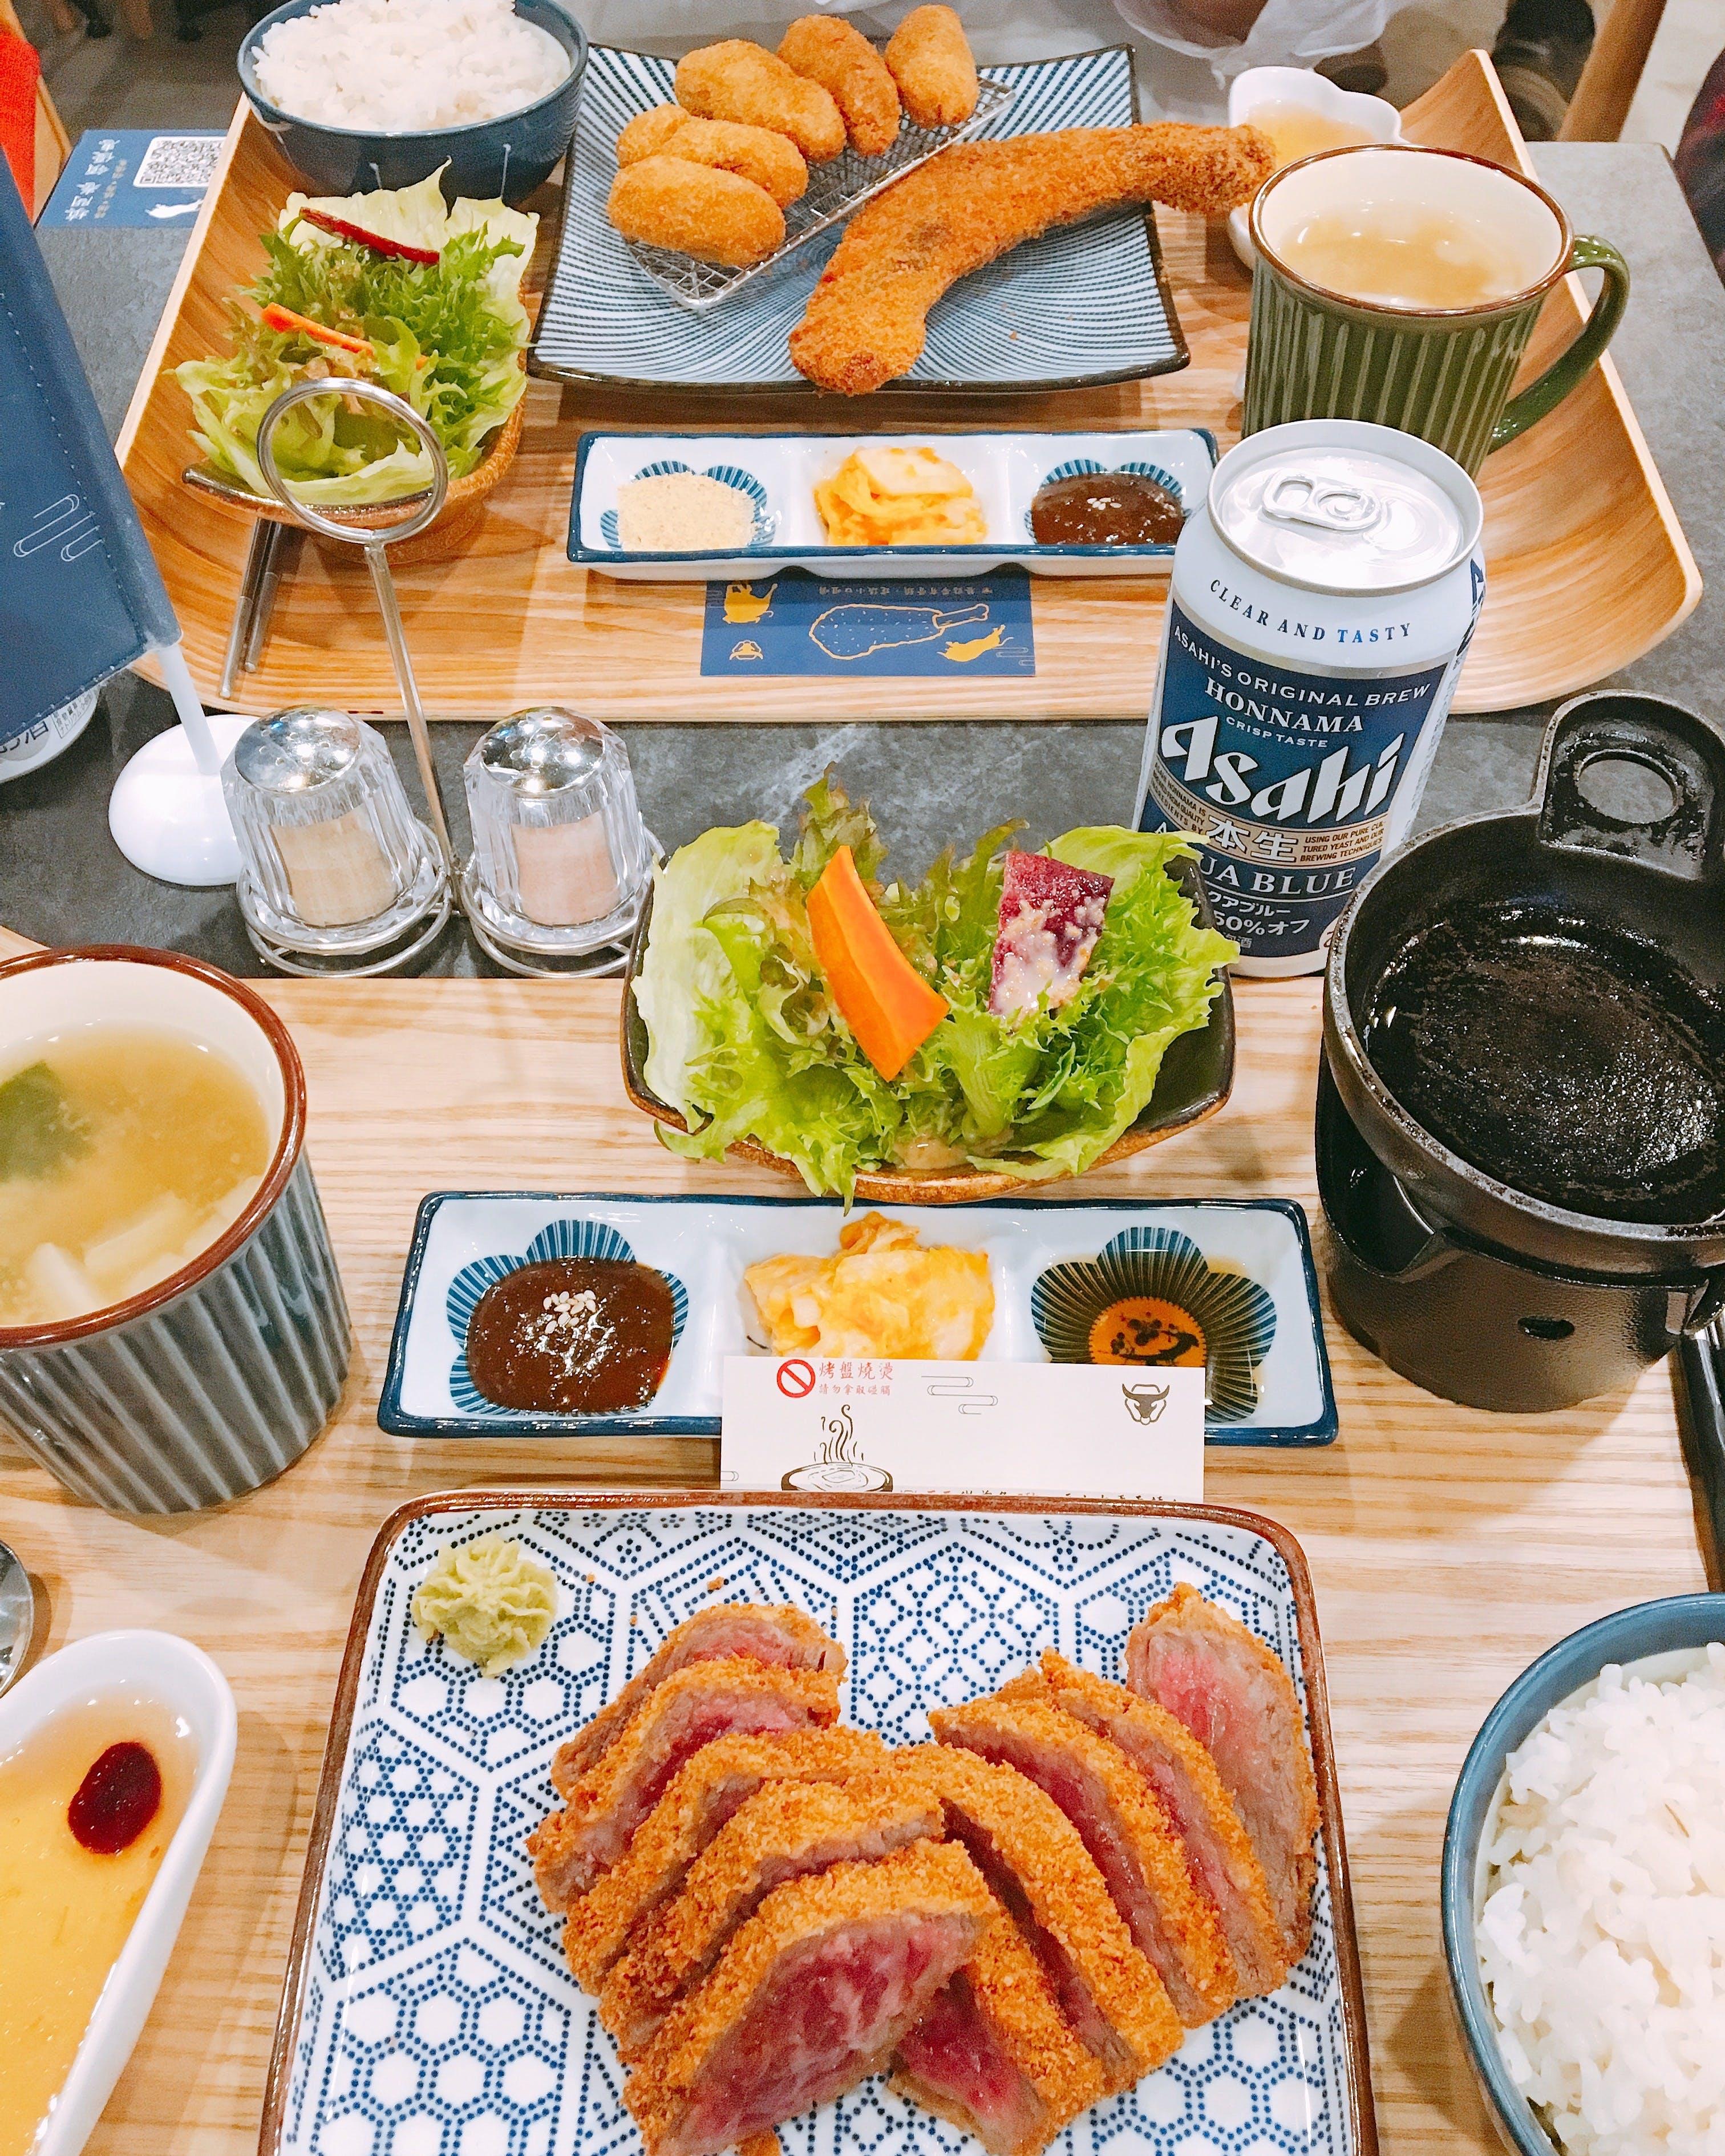 Fried Food on Plate